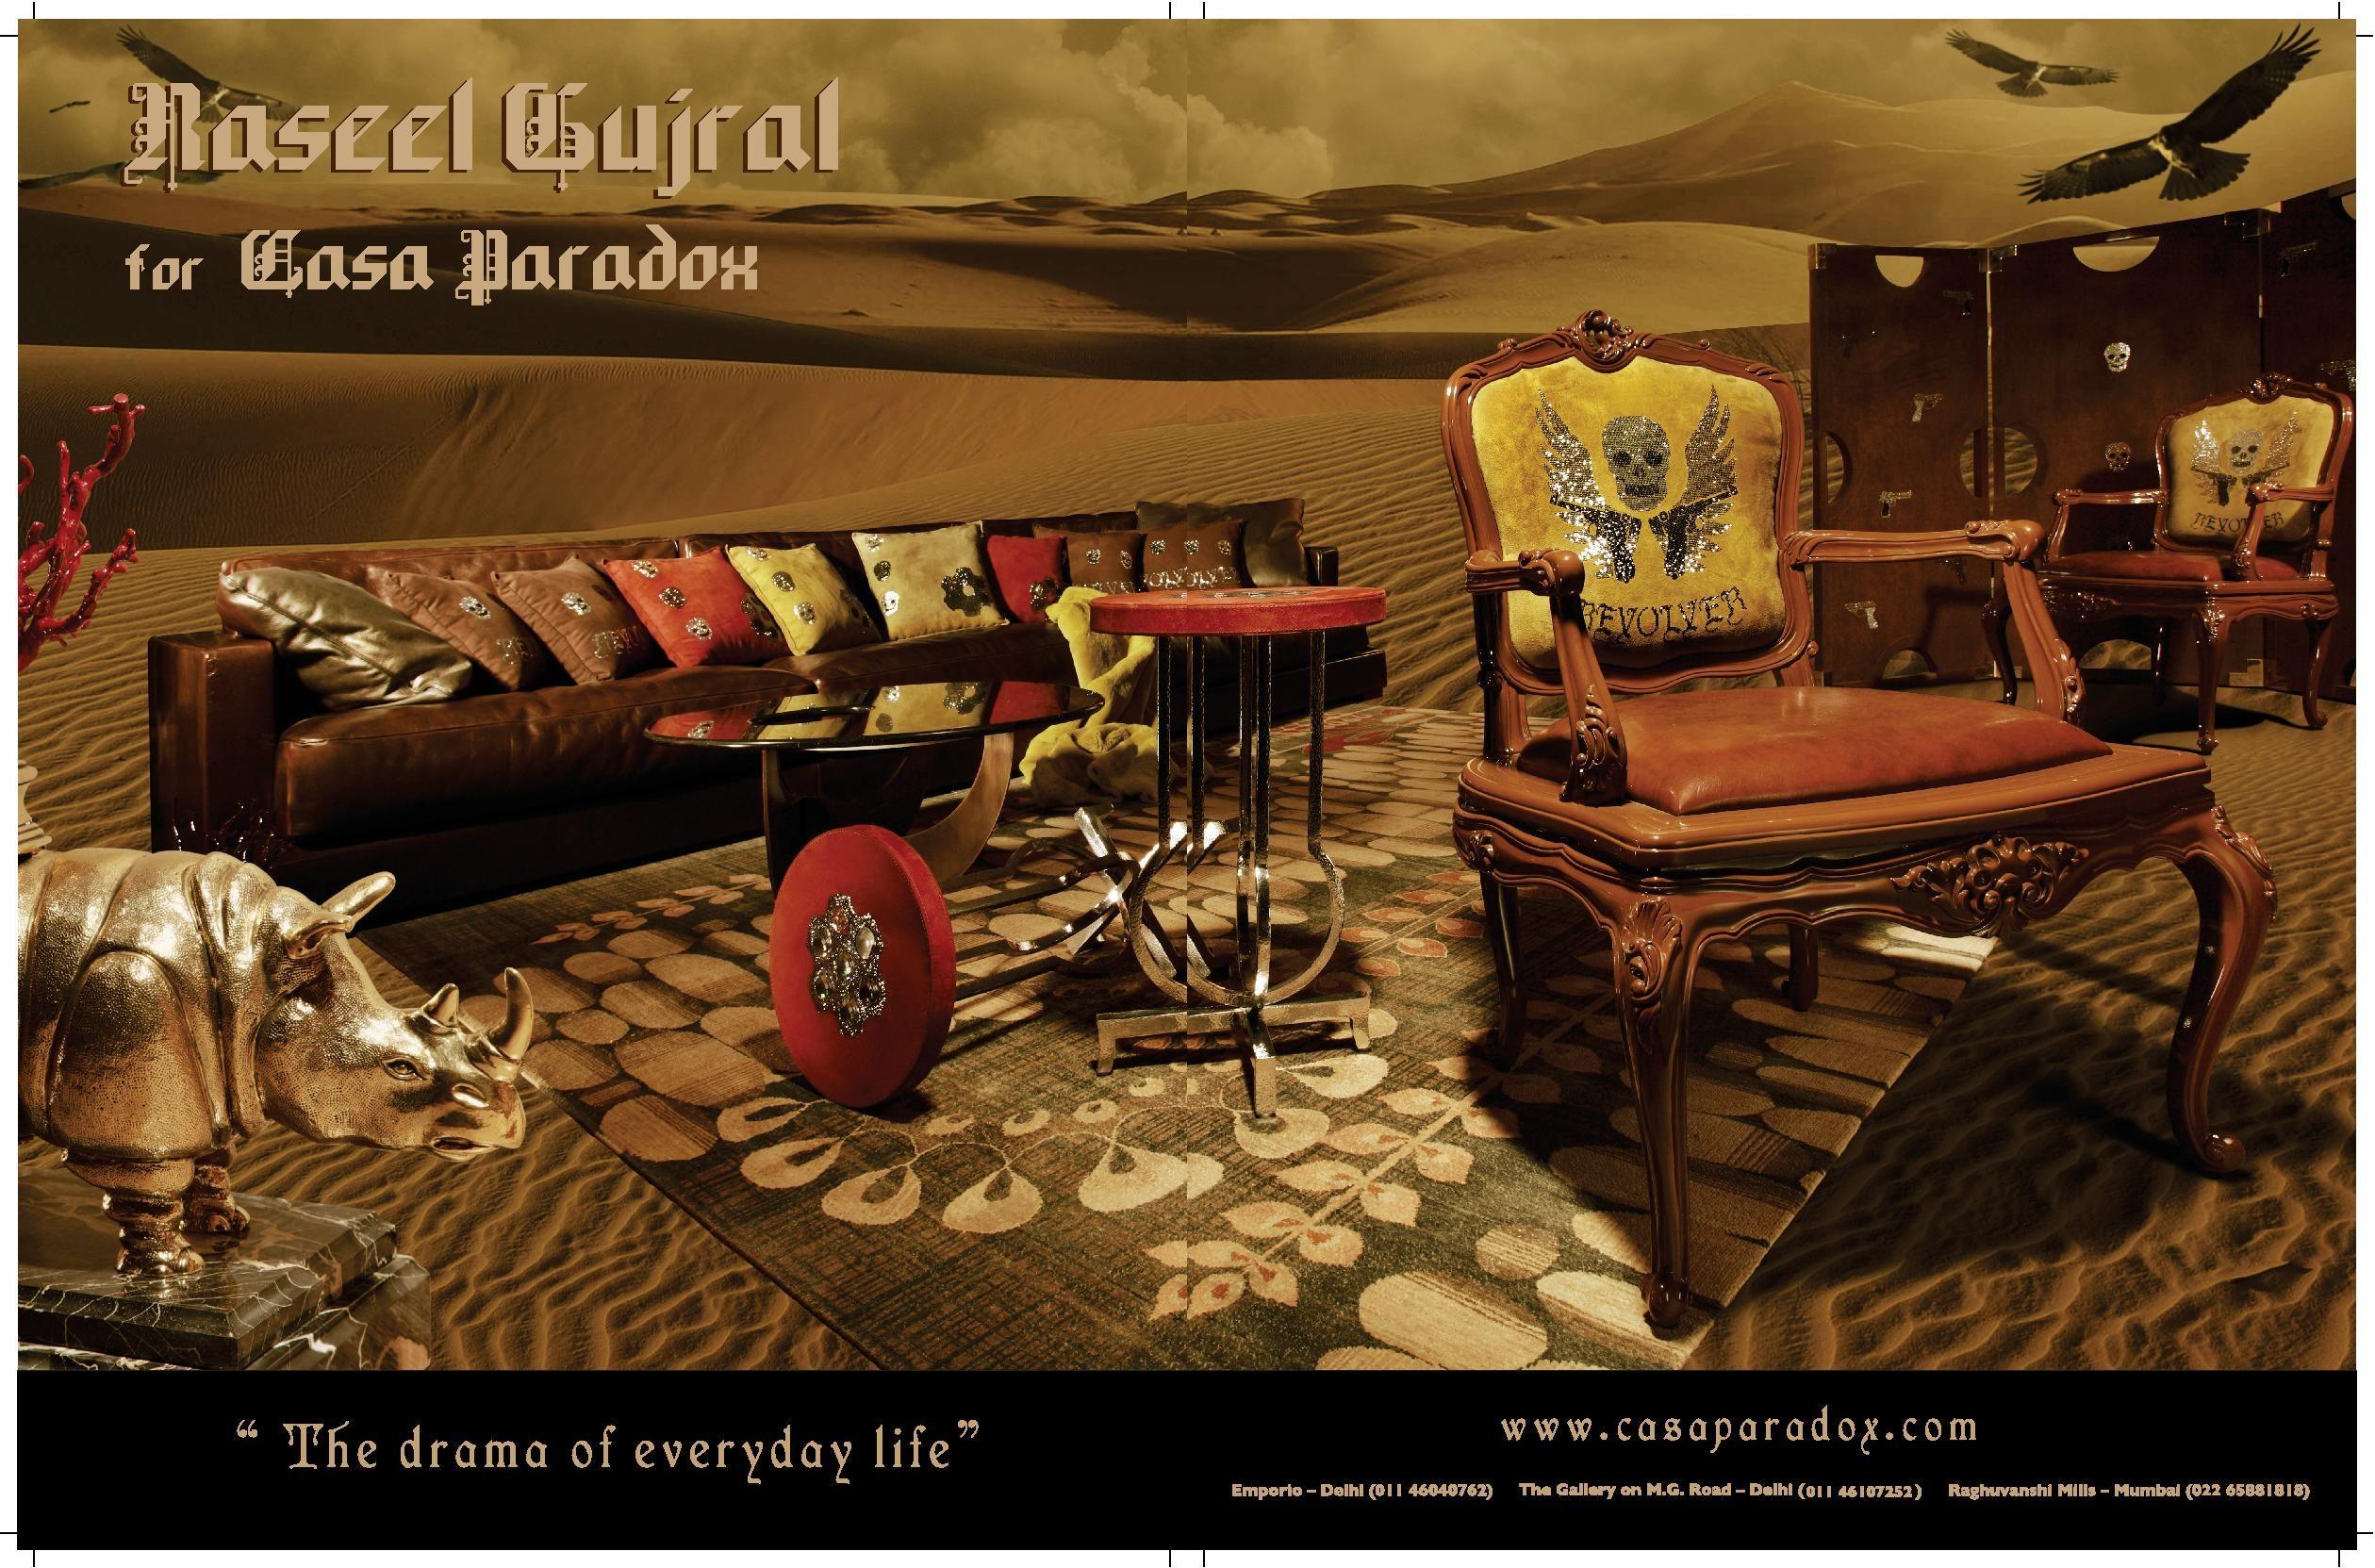 Casa Paradox In Airplanes Magazine Elle Decor 2012 In Media  # Muebles Kasa Design